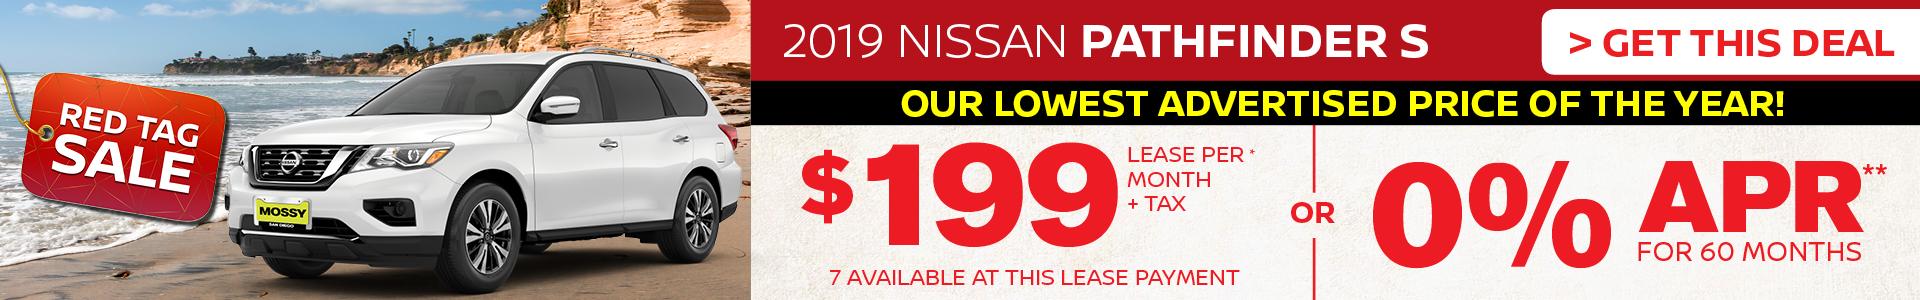 Mossy Nissan - Nissan Pathfinder $199 Lease